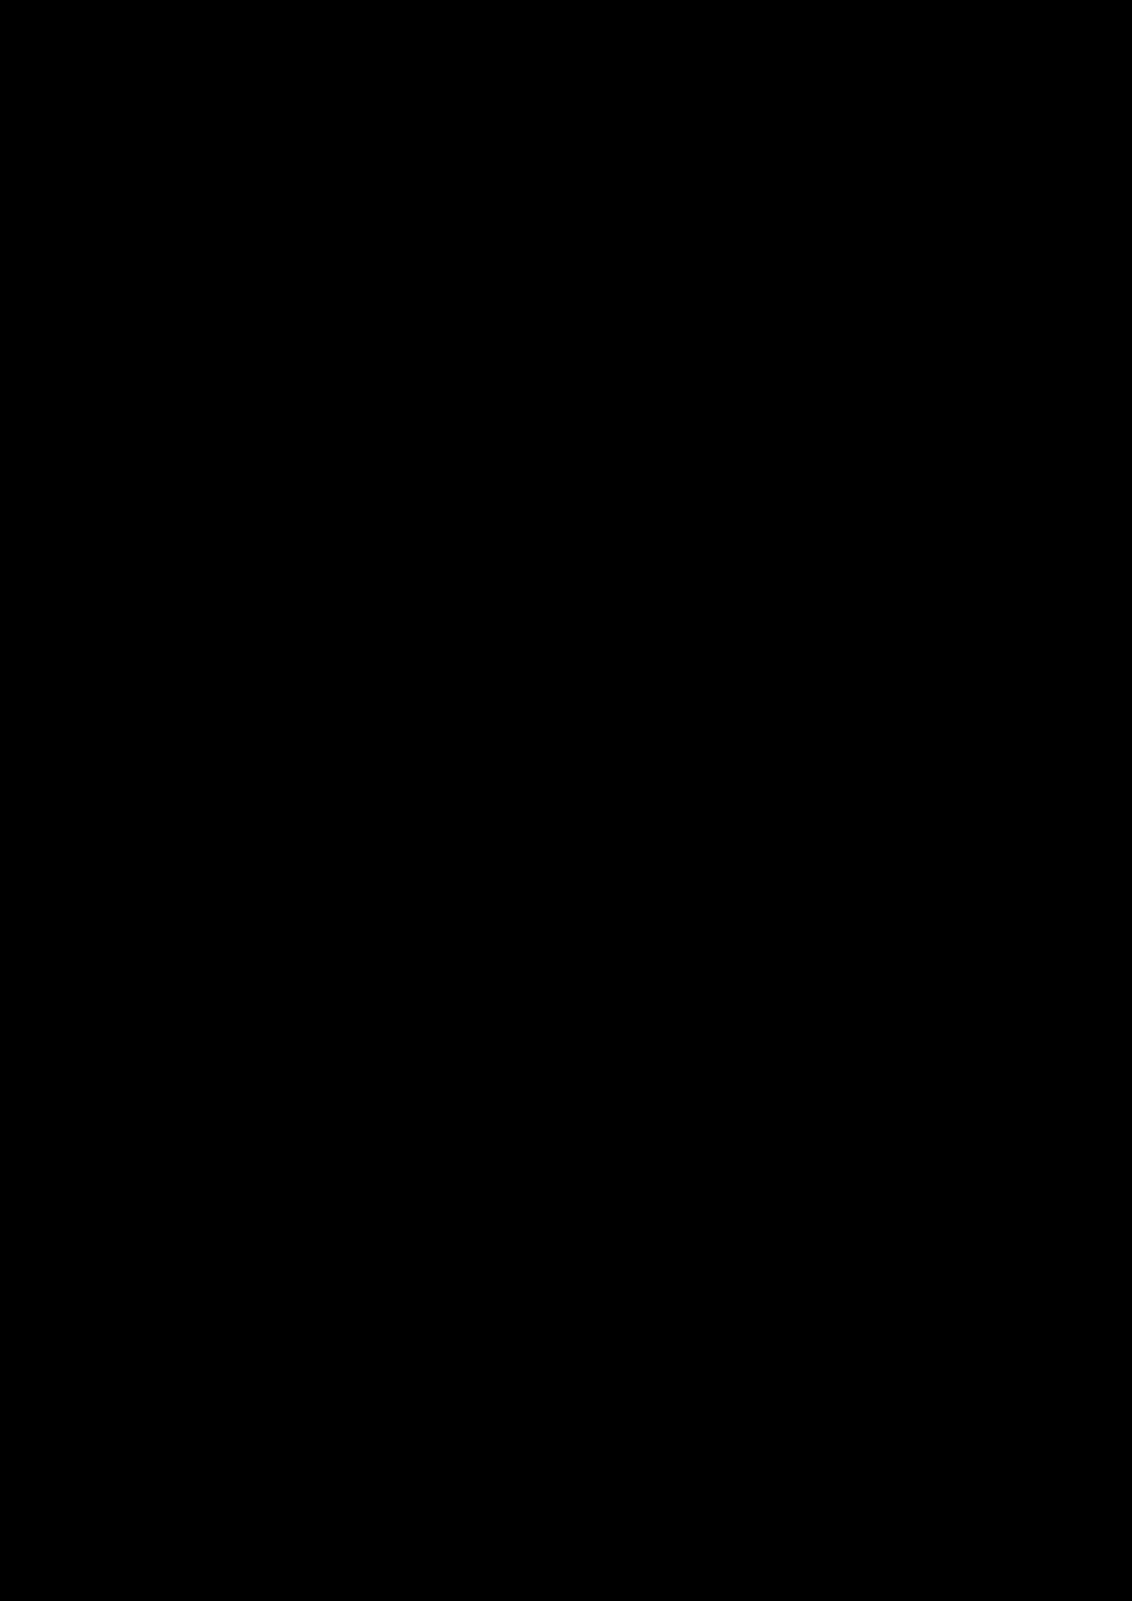 Ispoved Pervogo Boga slide, Image 67